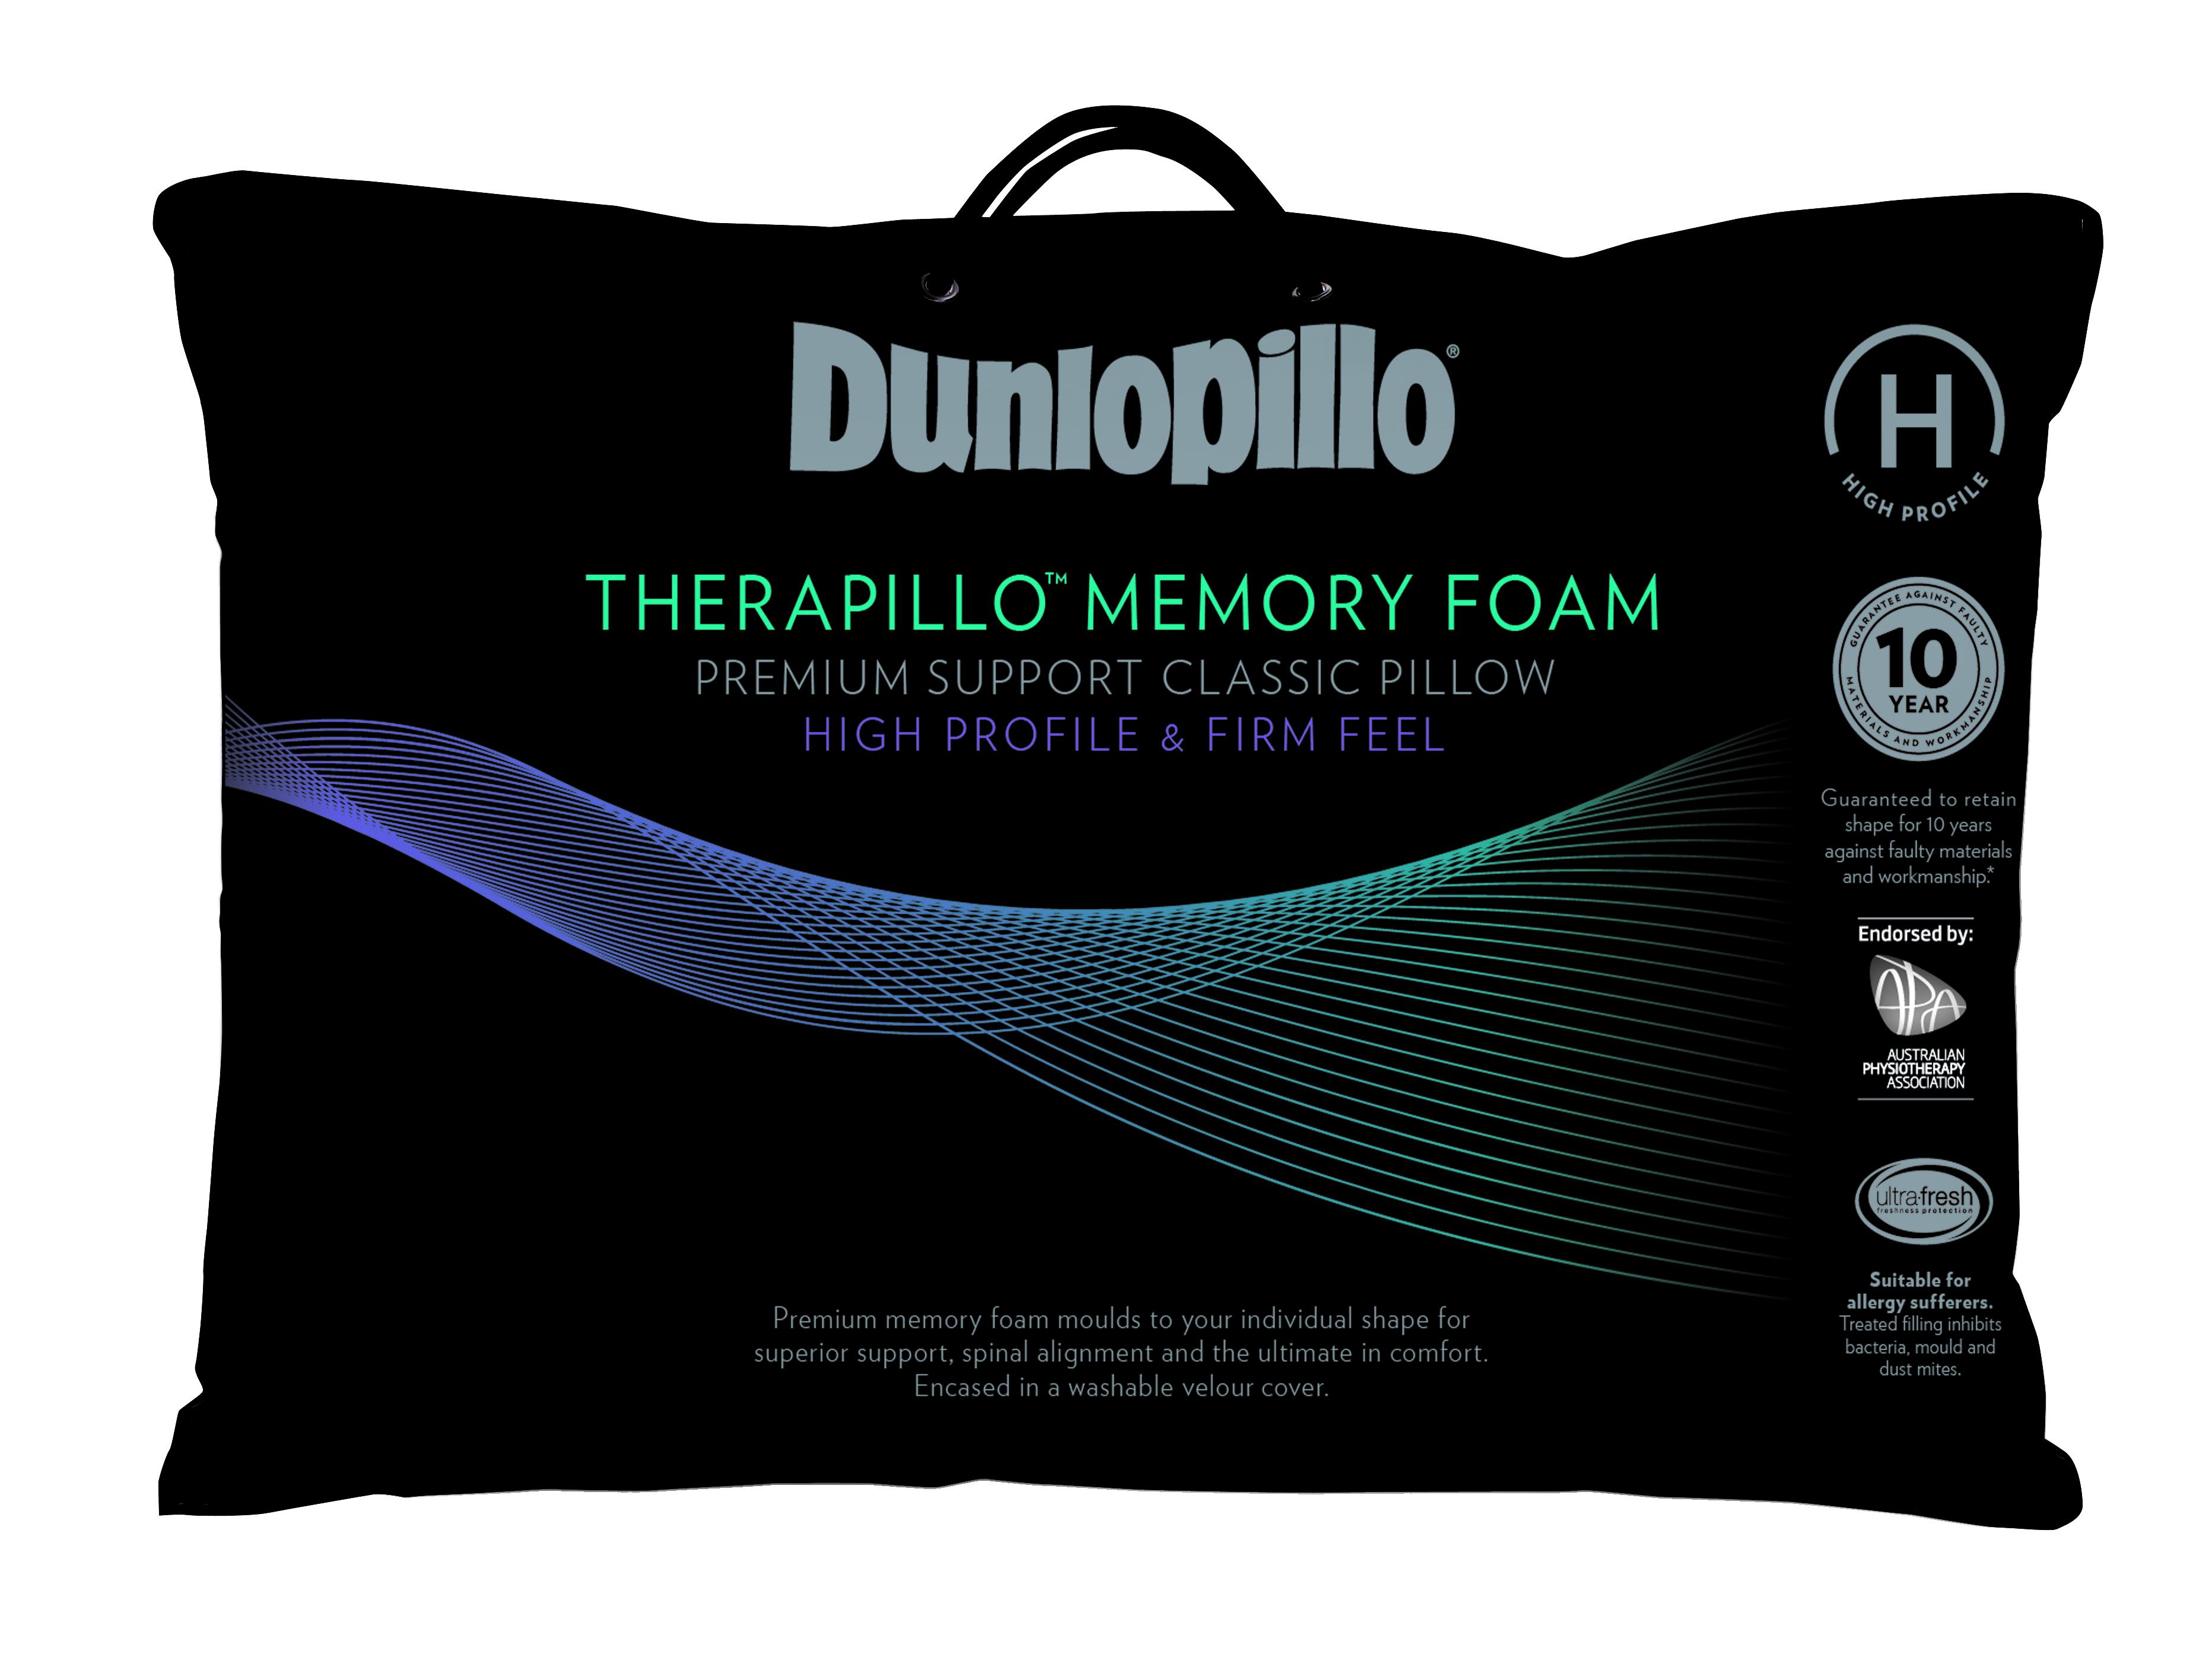 Dunlopillo Premium Memory Foam Pillow High Profile